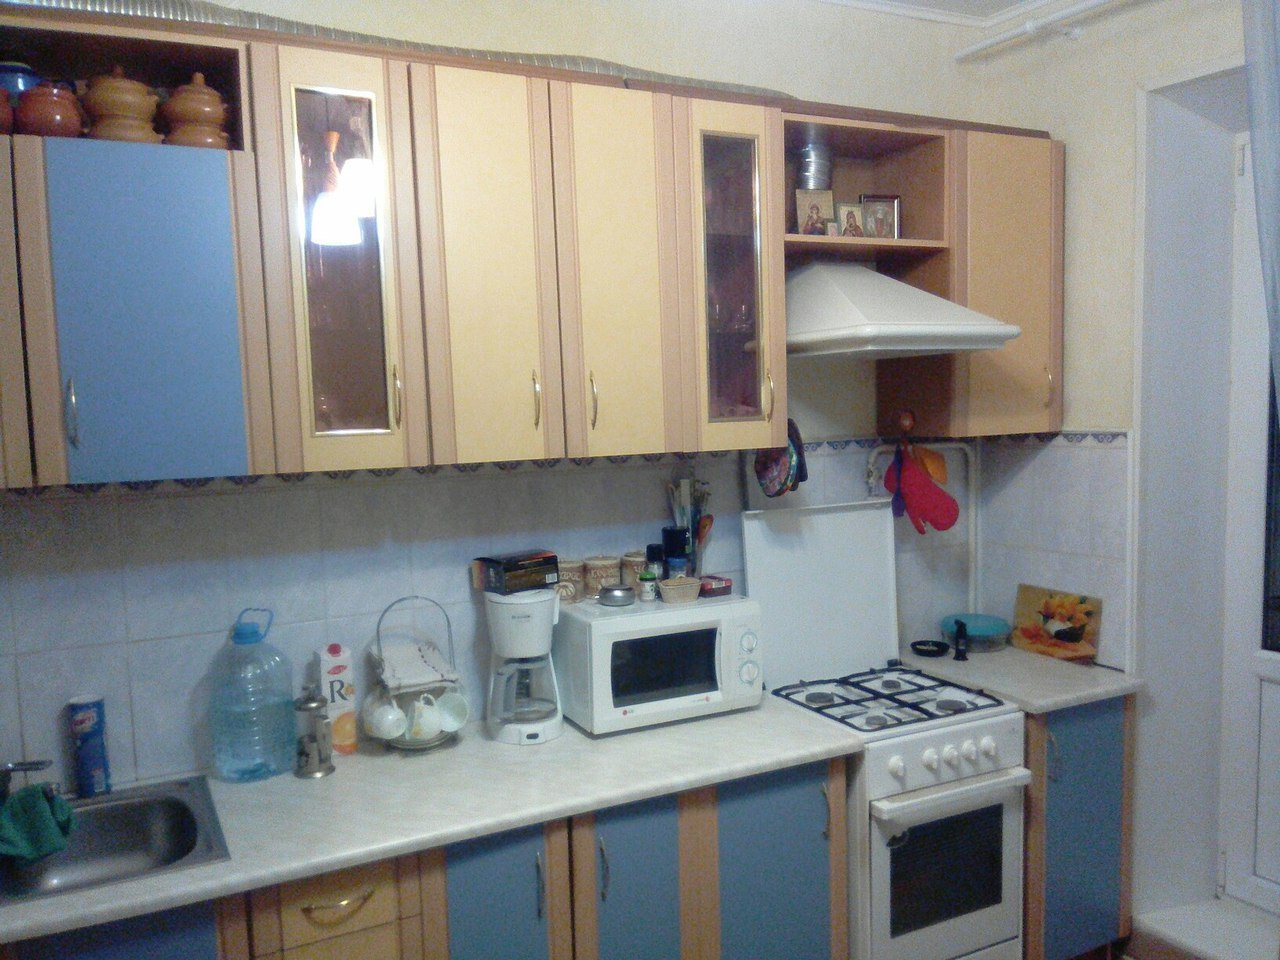 Продажа квартир: 2-комнатная квартира, республика Башкортостан, Стерлитамак, Коммунистическая ул., 80, фото 1